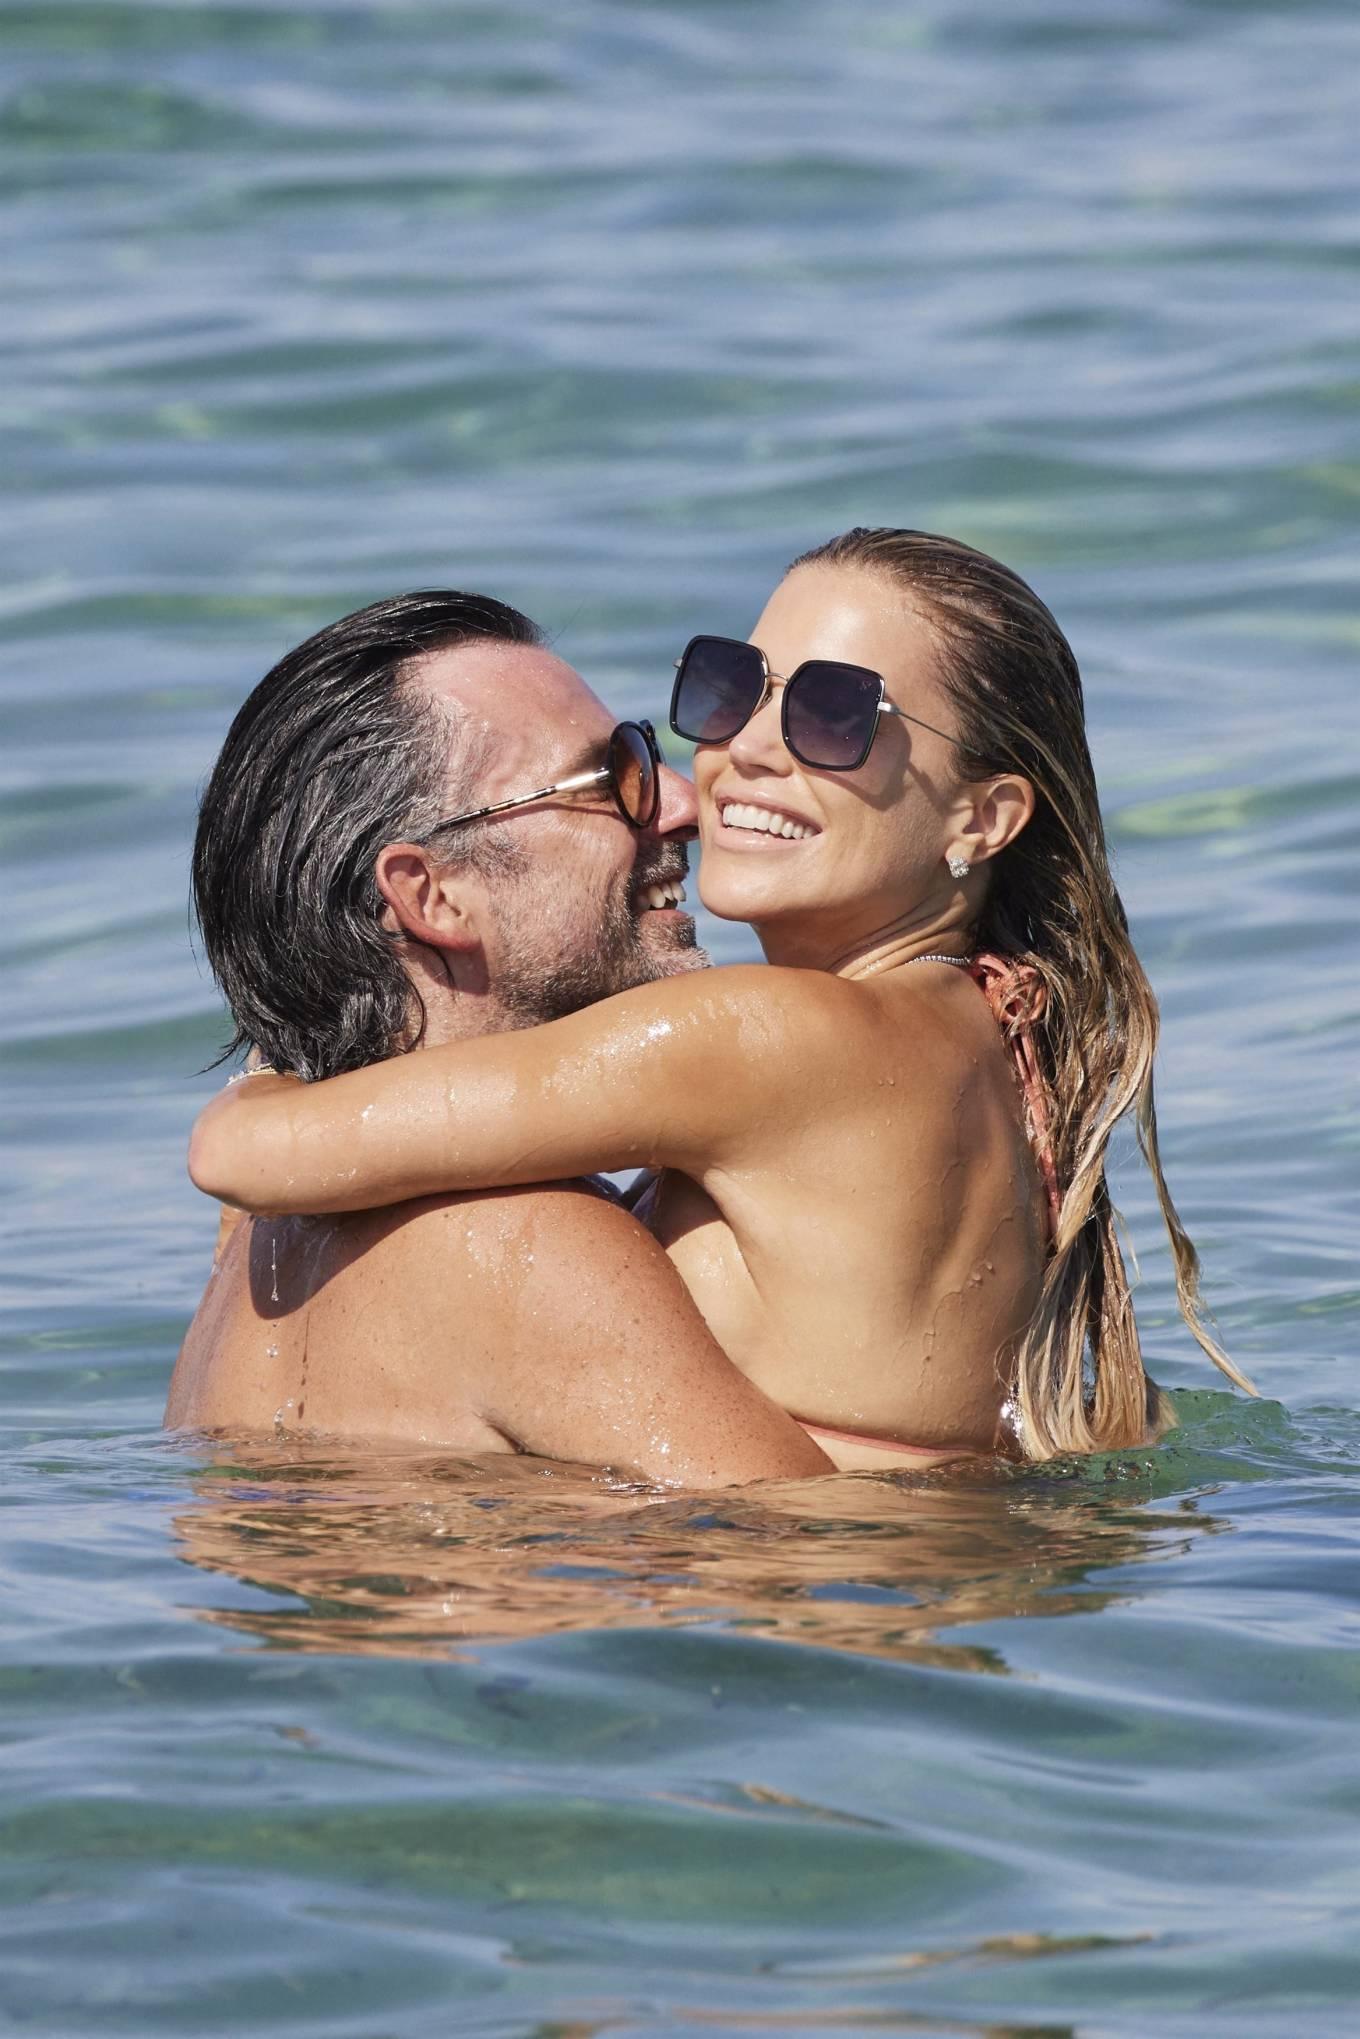 Sylvie Meis 2021 : Sylvie Meis – In a bikini with her husband Niclas Castello on the beach La Réserve in Ramatuelle-06